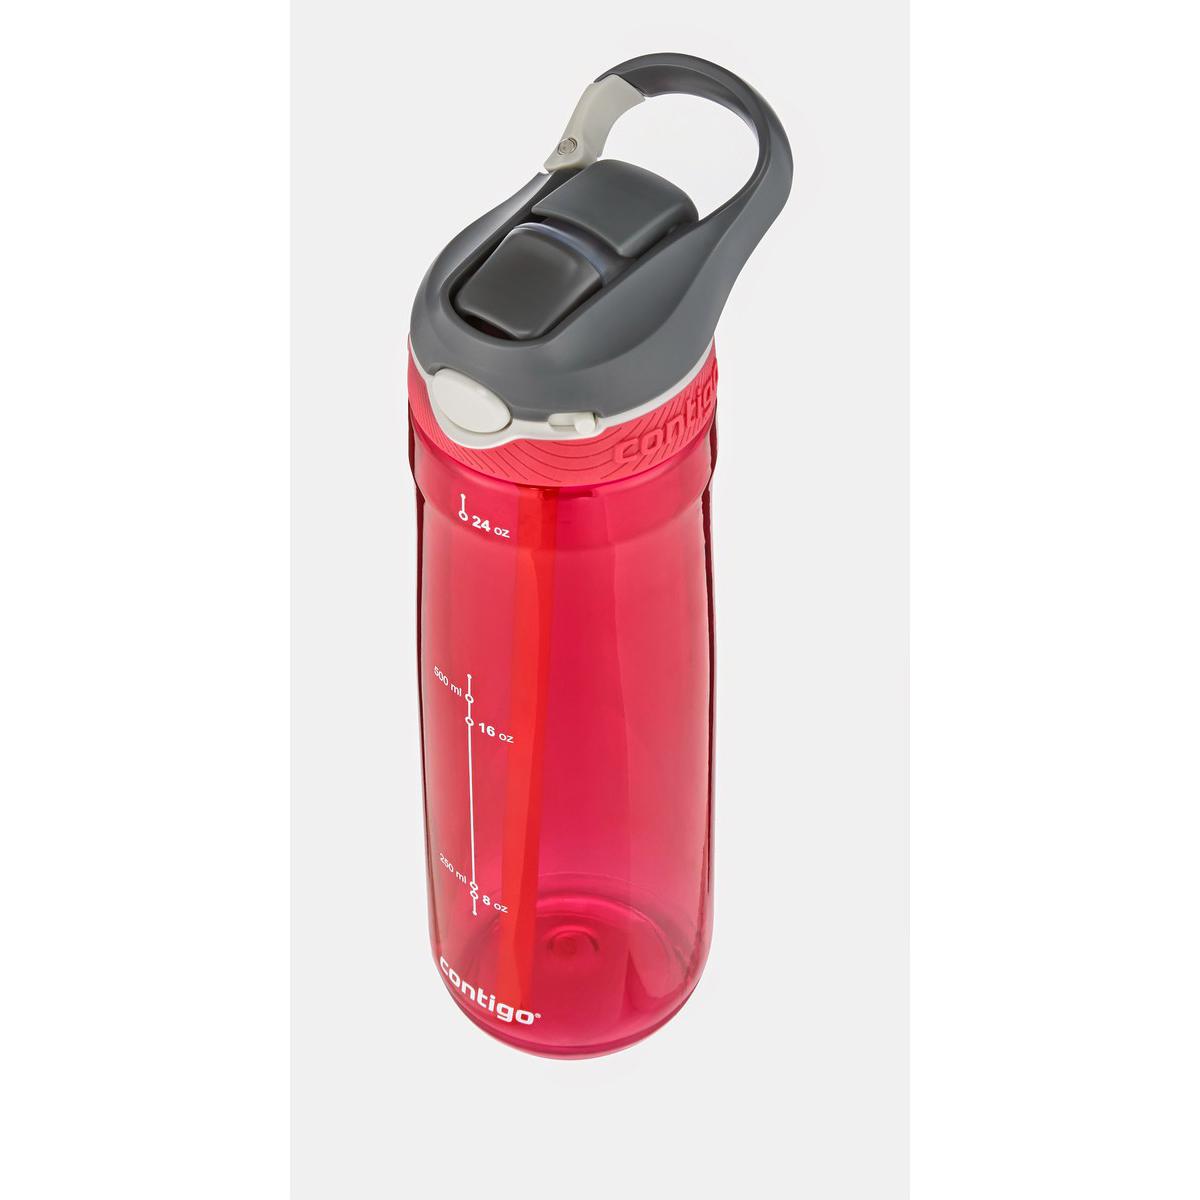 Бутылка для воды Contigo Ashland, цвет: красный, 720 мл lacoste eau de lacoste l 12 12 pour elle elegant туалетная вода 90 мл